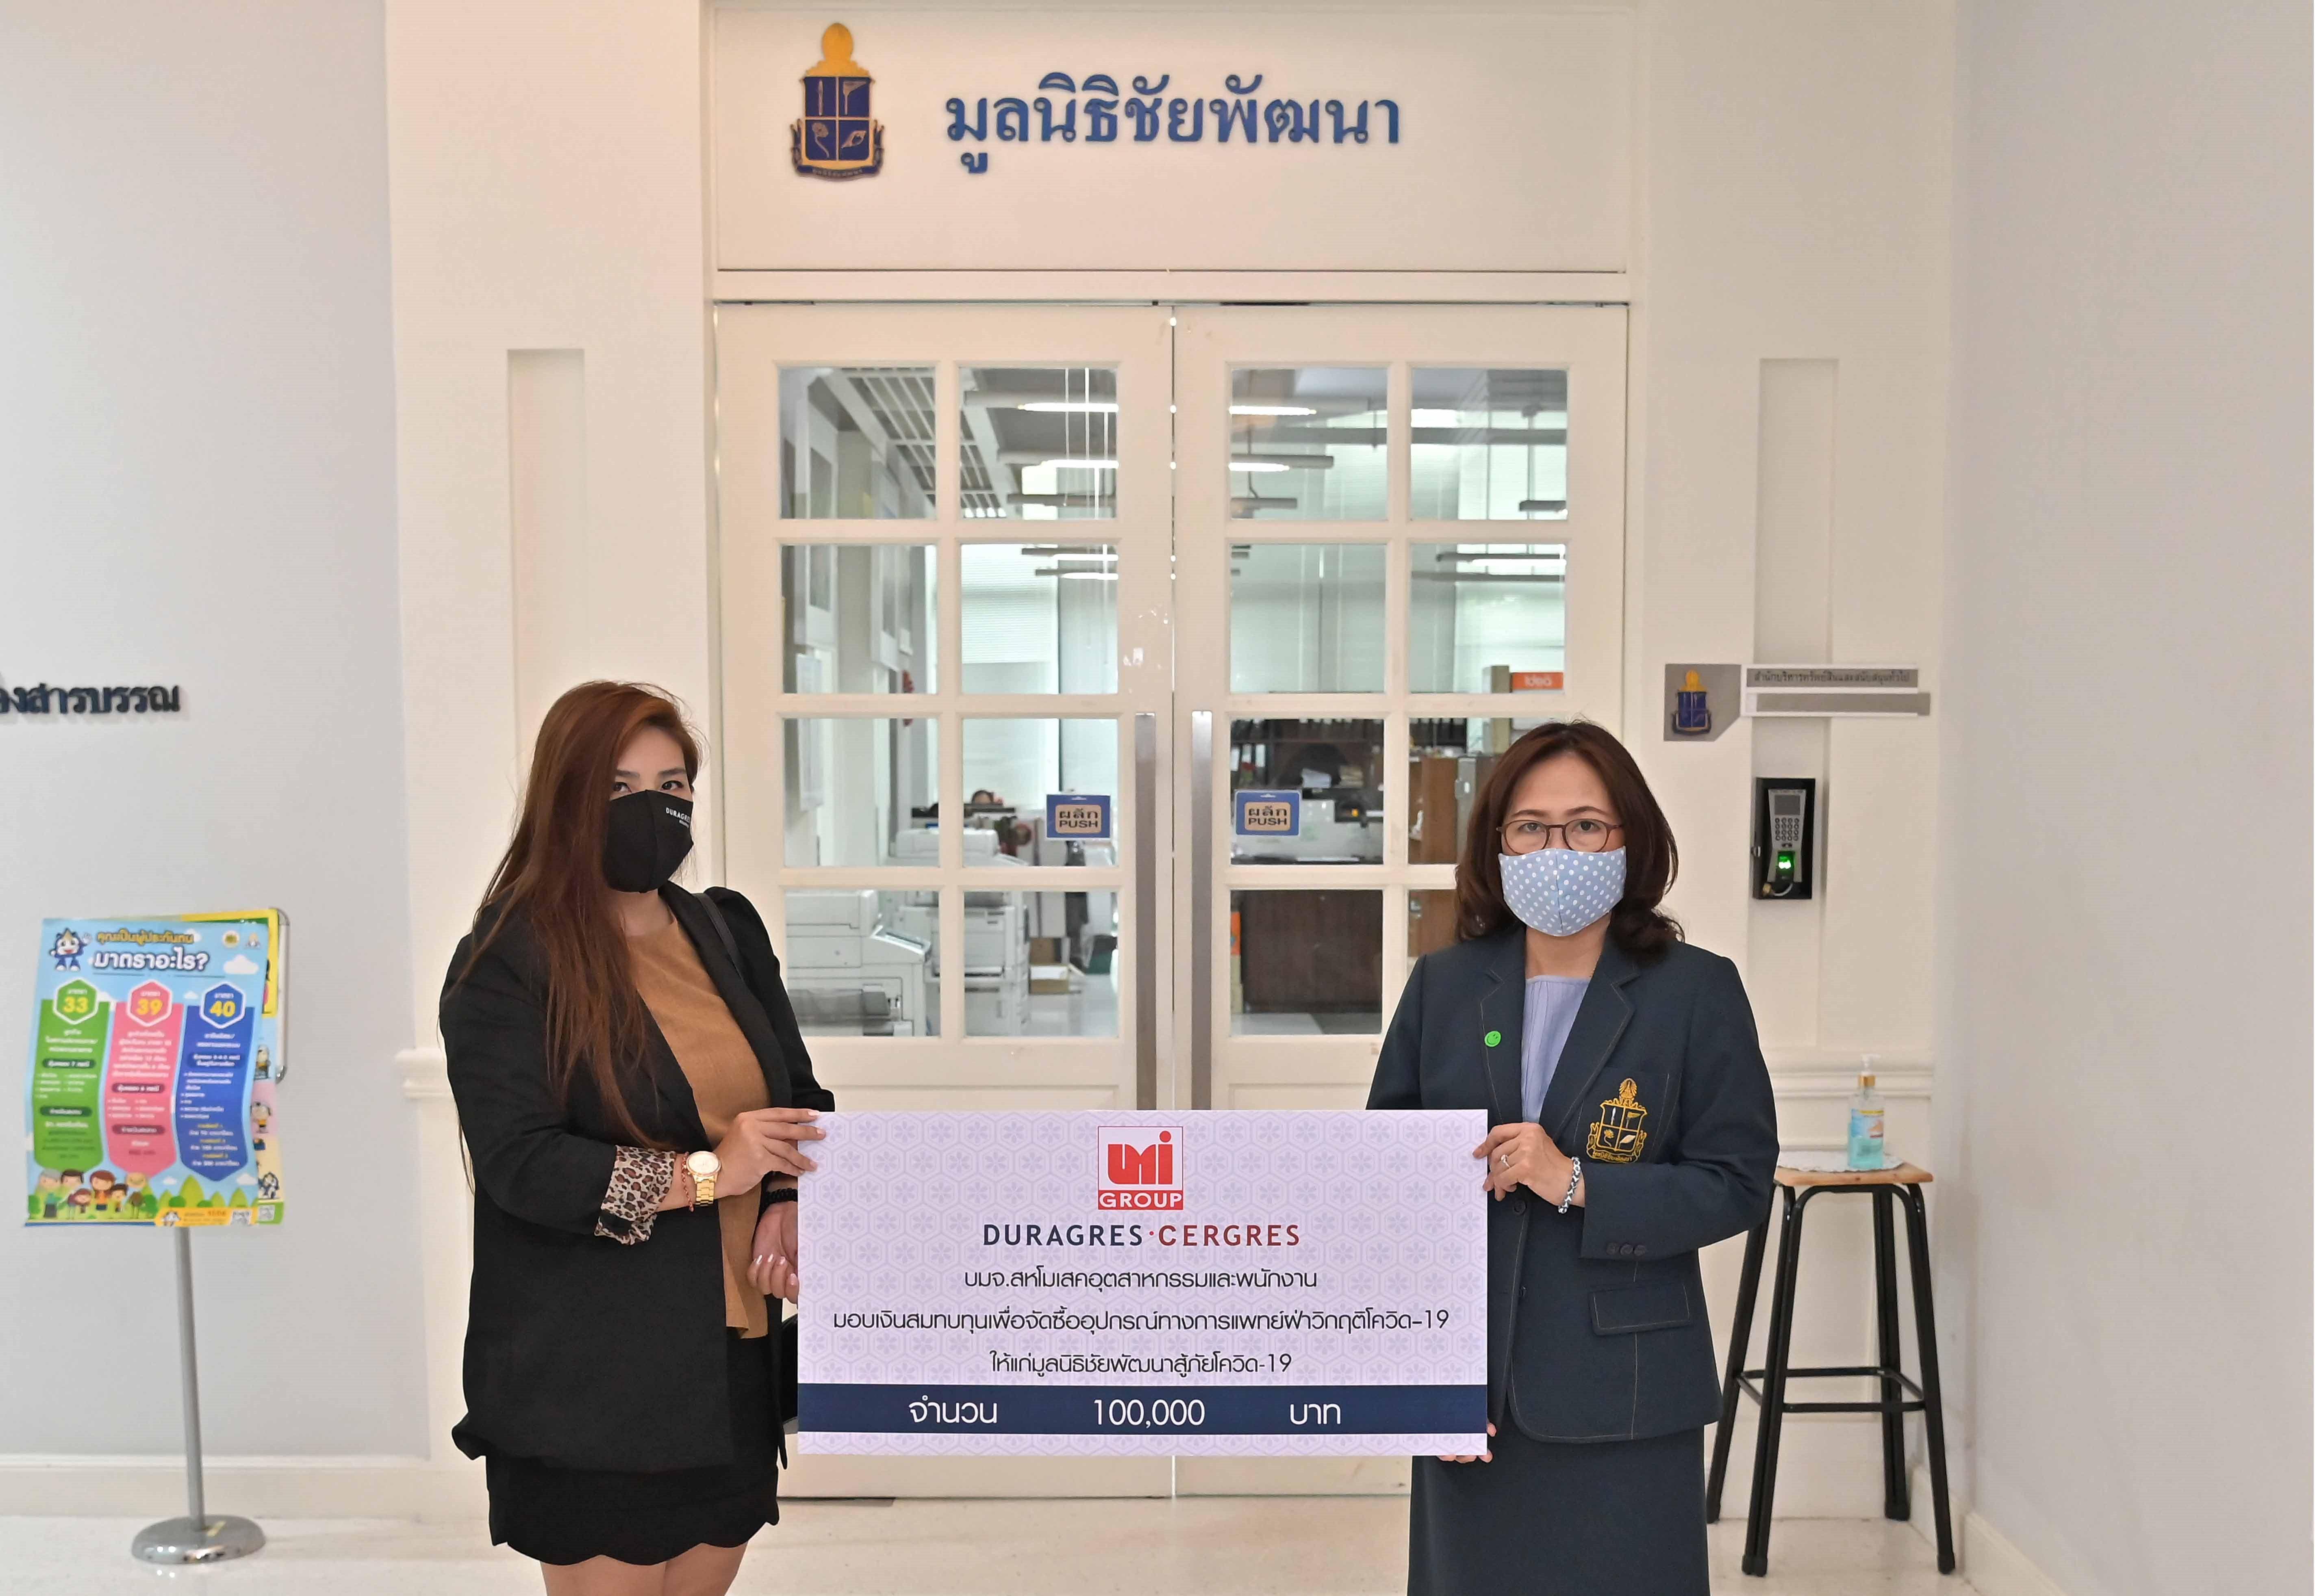 UMI GROUP ส่งพลังน้ำใจช่วยบุคลากรทางการแพทย์และคนไทยฝ่าวิกฤติโควิด - 19